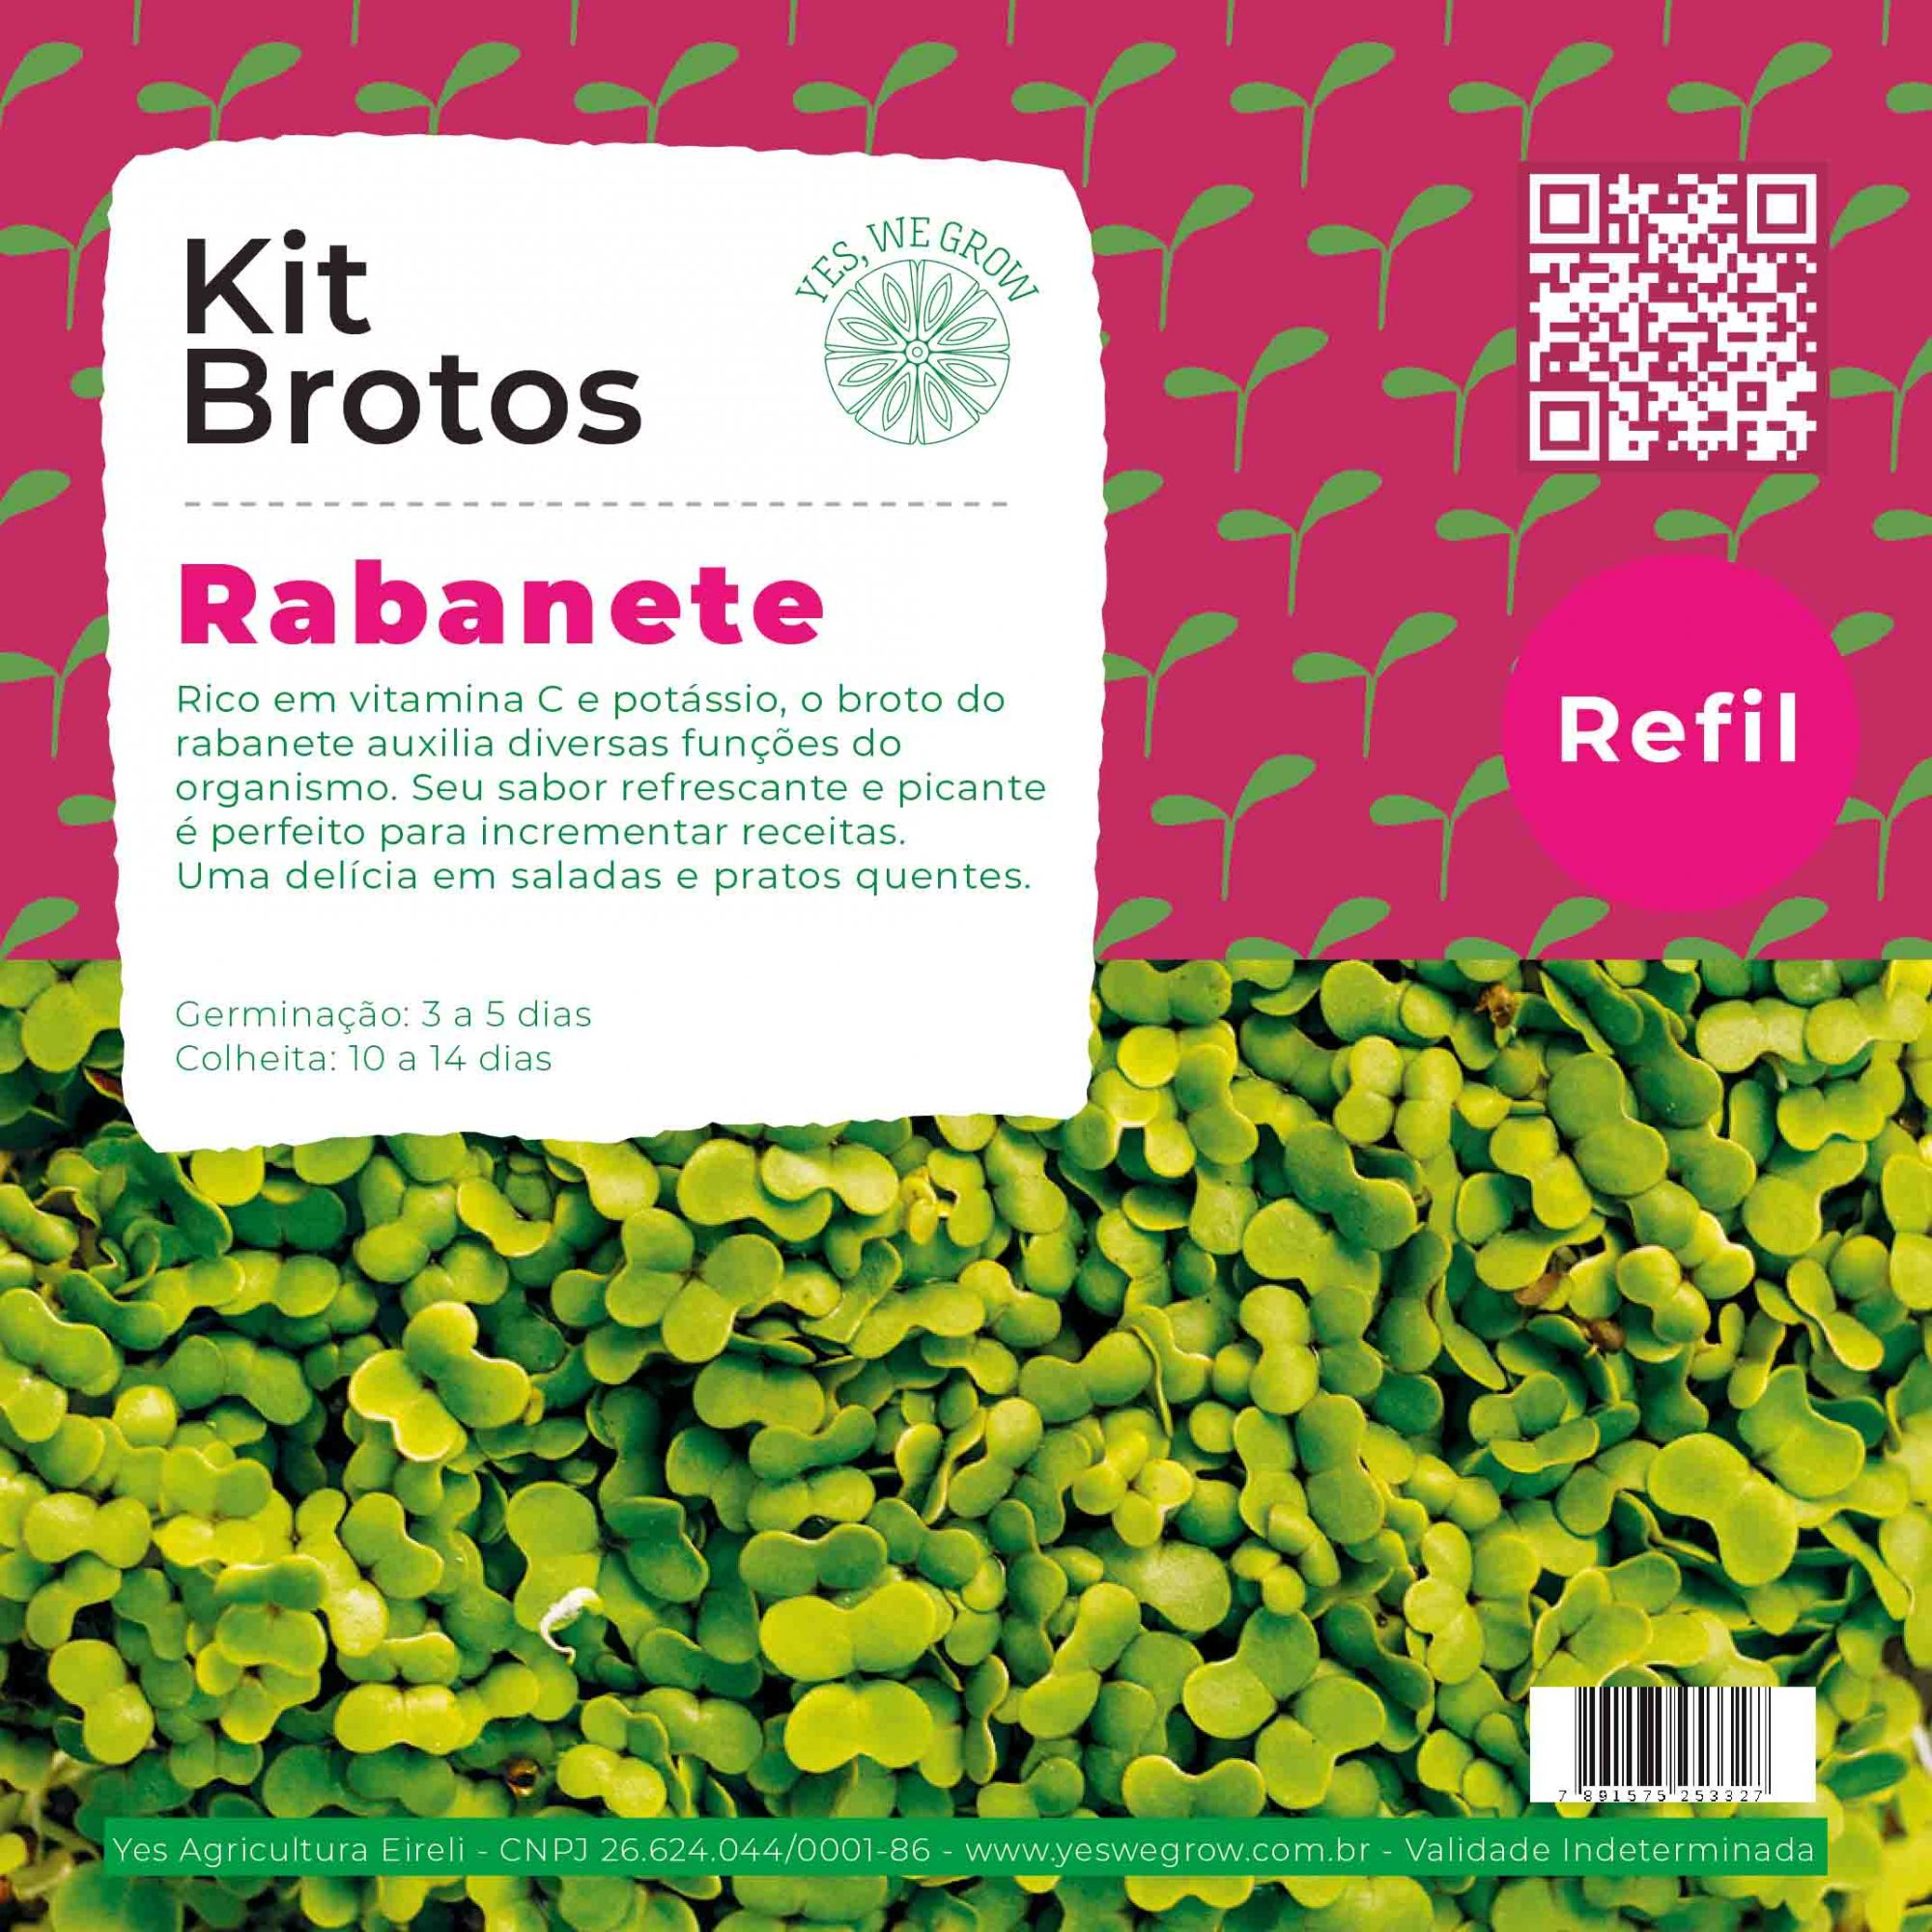 Refil para Kit Brotos Rabanete